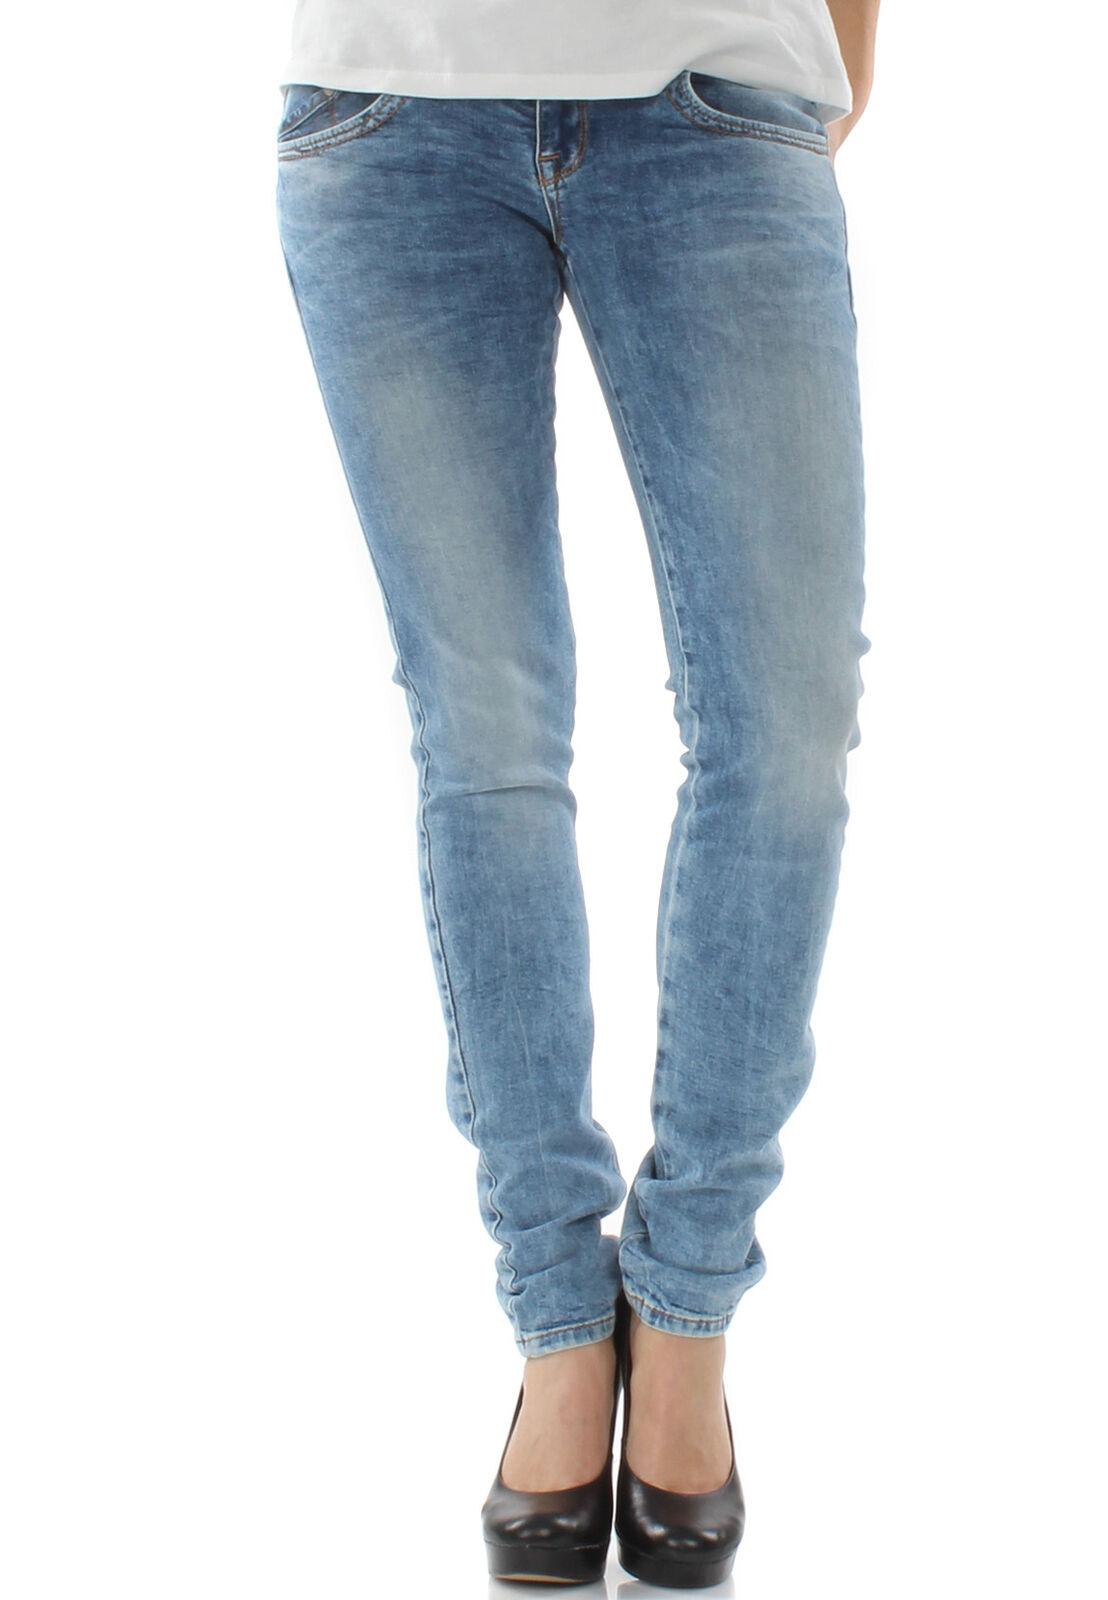 Ltb Jeans Ladies Molly Myra Wash Light bluee